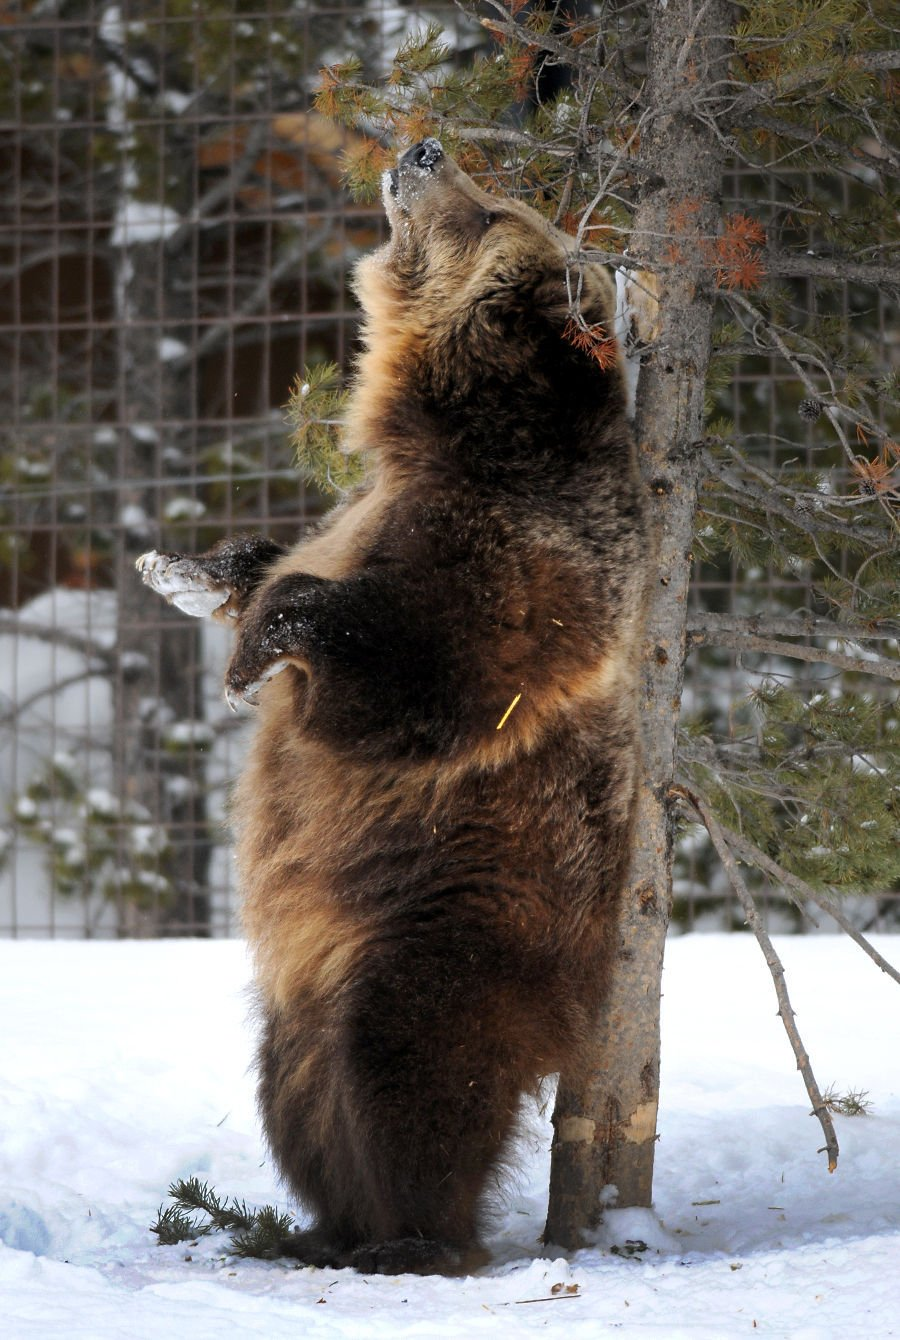 120915 bear2 kw.jpg